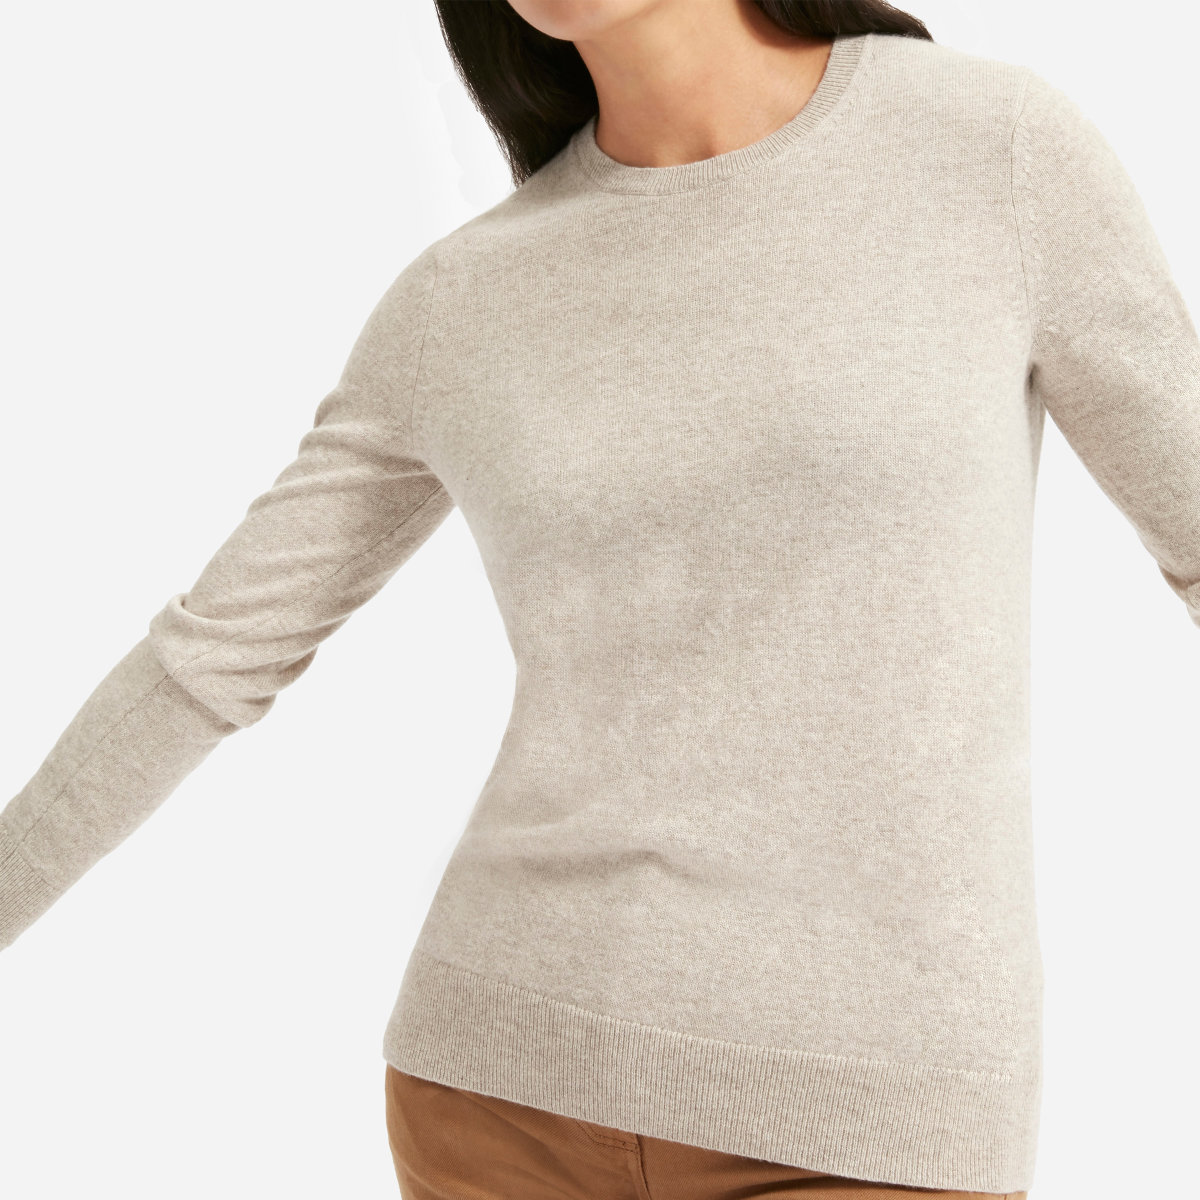 d562420b2a Everlane Cozy Cashmere Sweater-Meghan Markle - Dress Like A Duchess